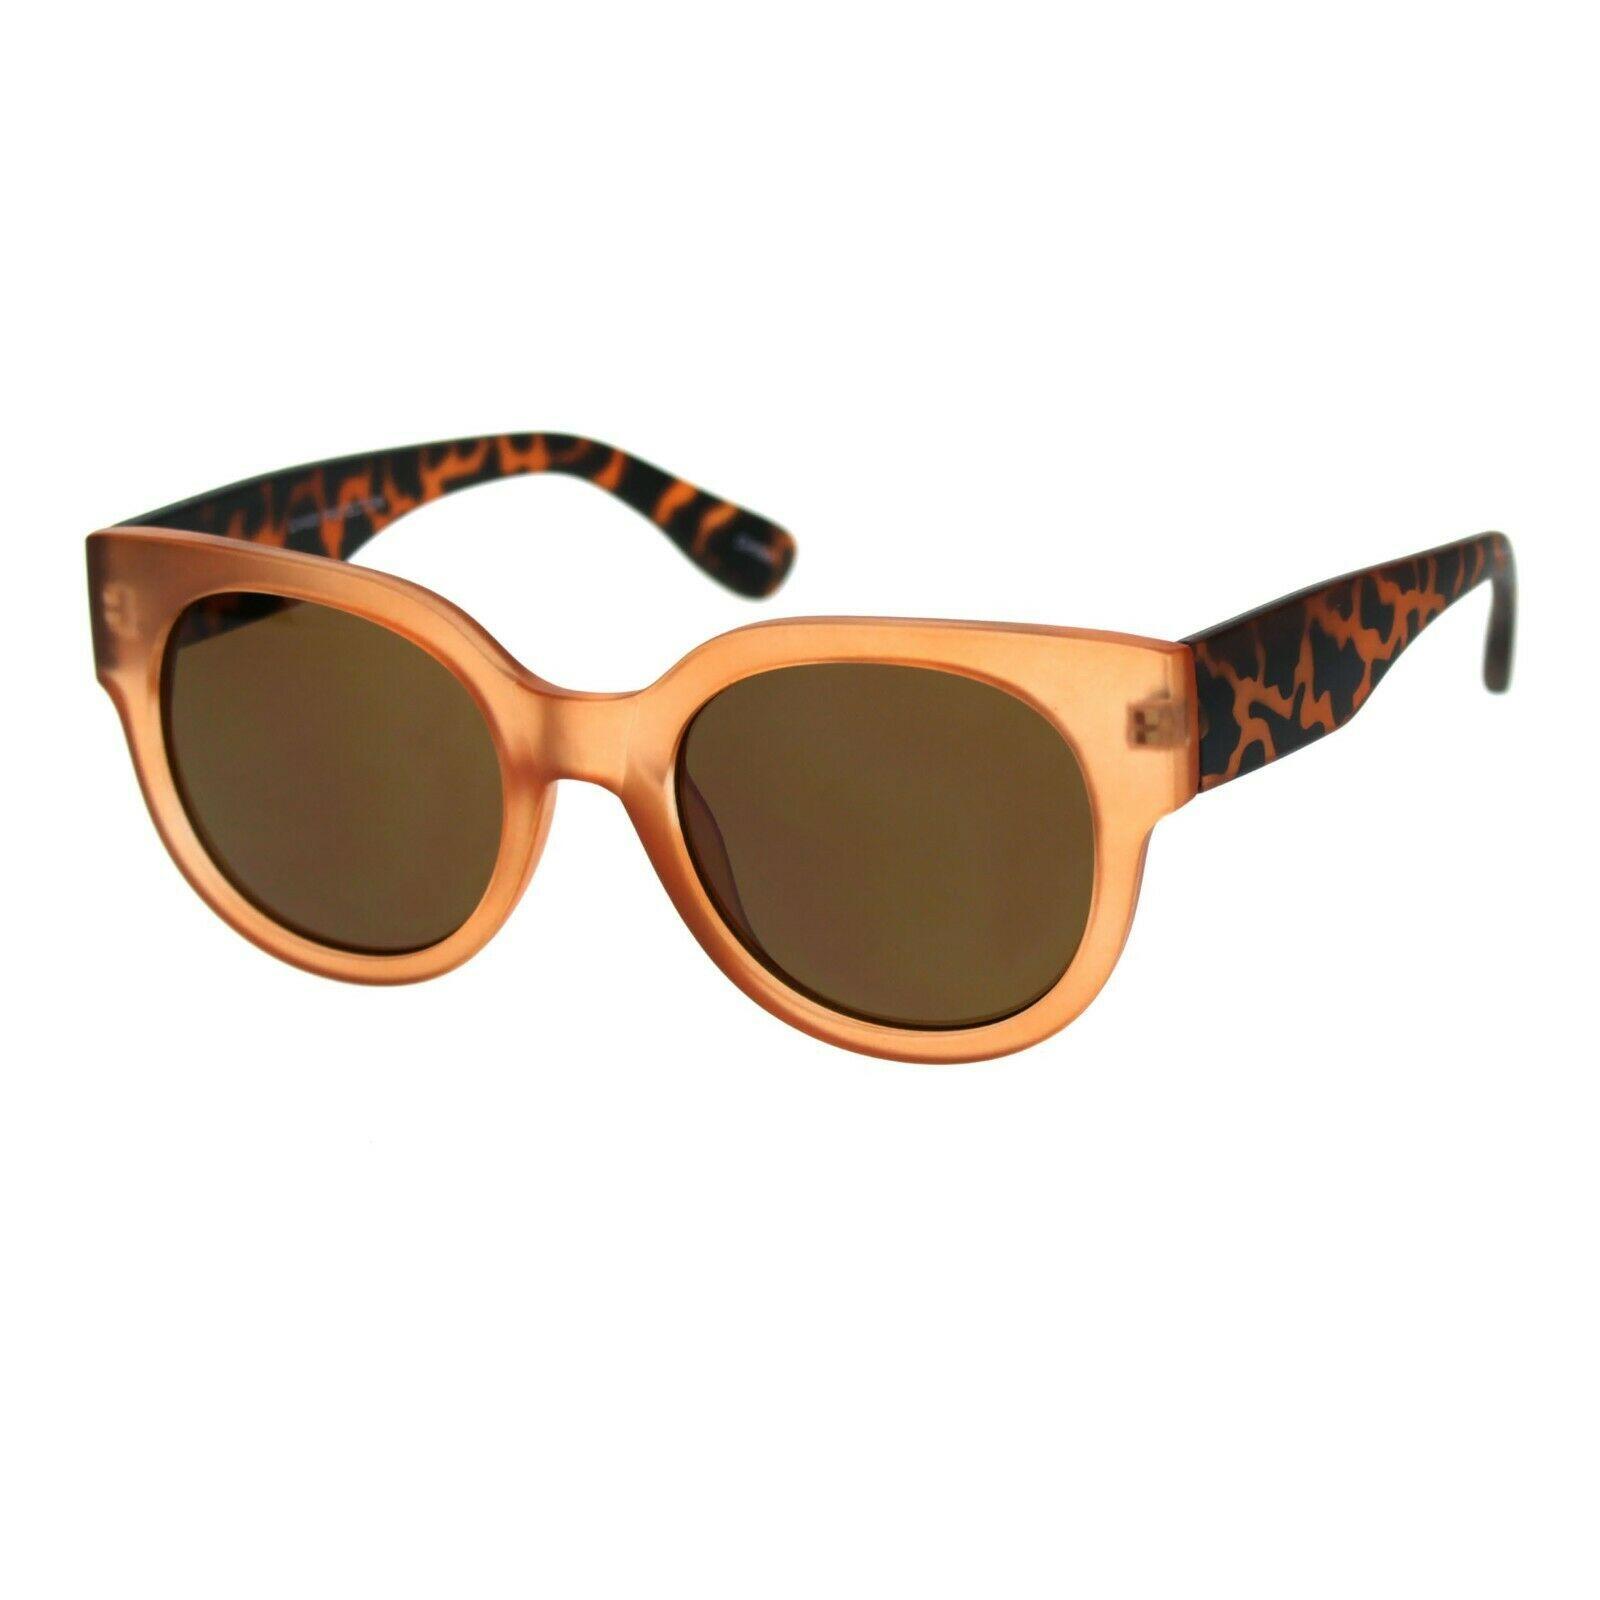 Womens Round Horn Rim Sunglasses Trendy Retro Fashion Shades UV 400 image 2